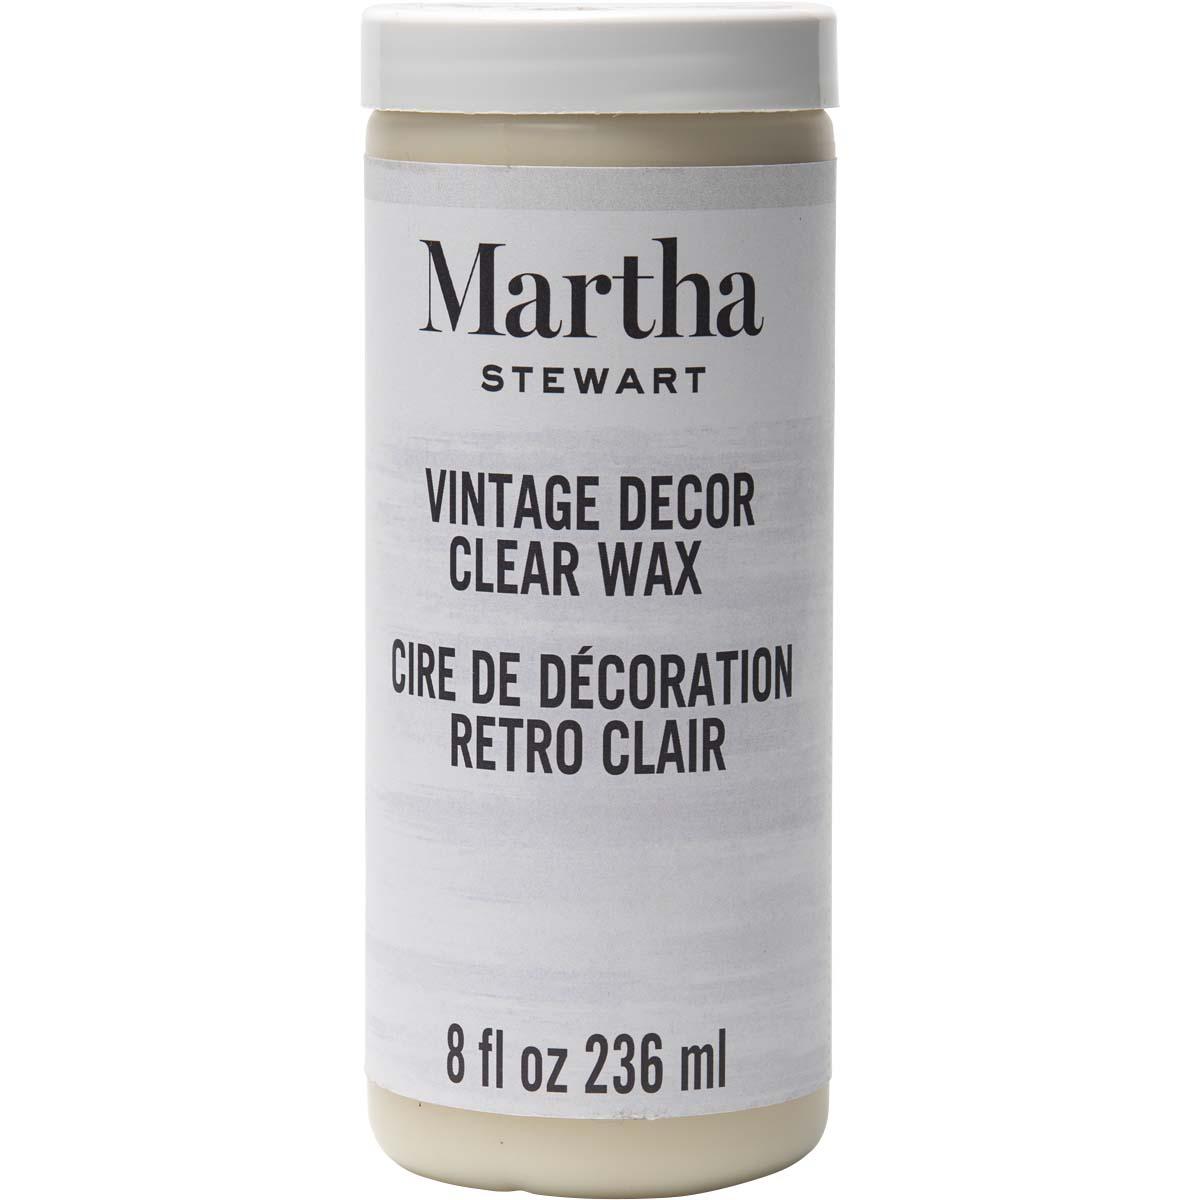 Martha Stewart® 8oz Vintage Décor Wax - Clear